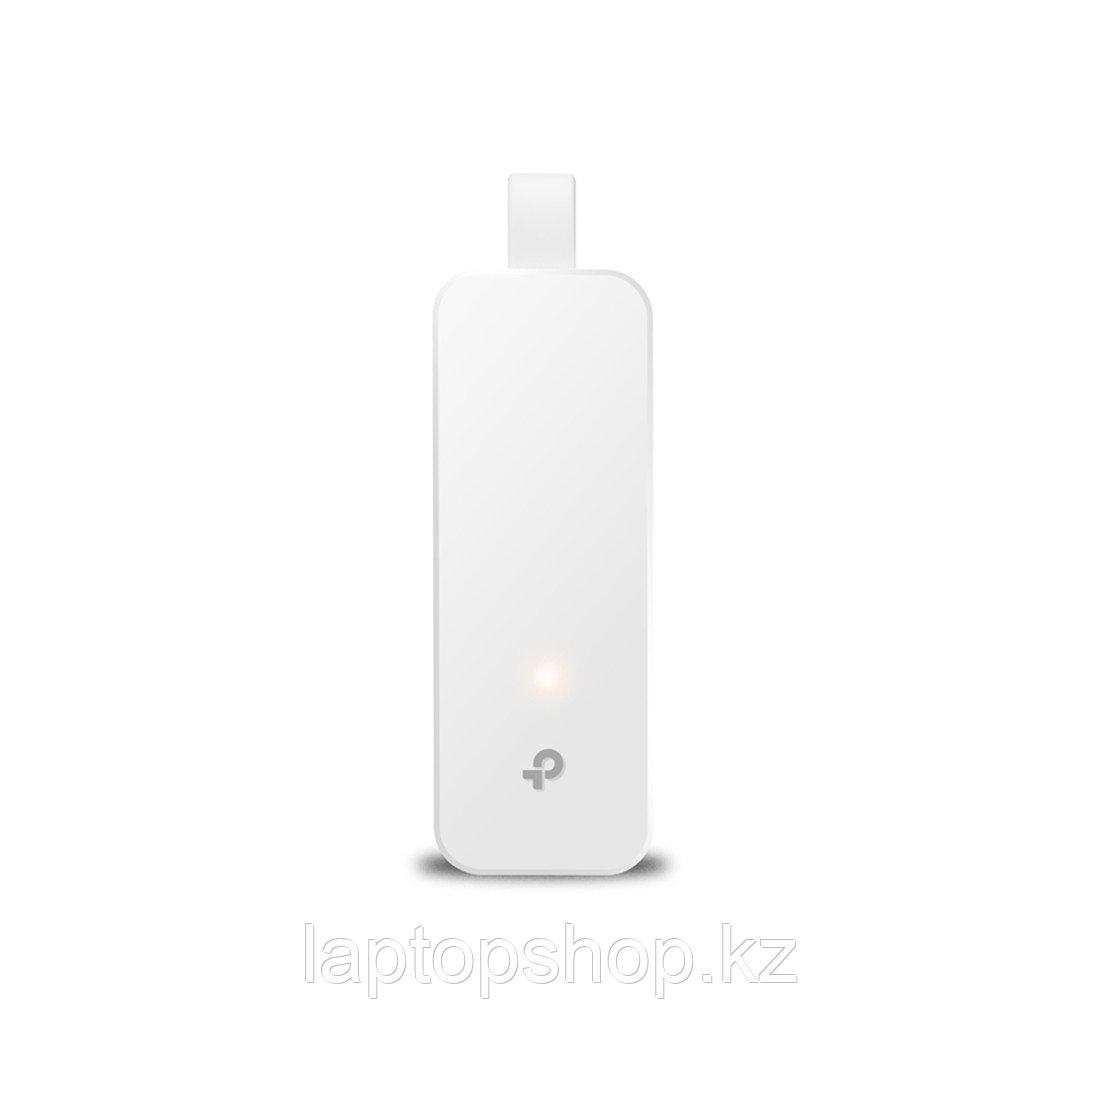 Сетевой адаптер TP-Link UE300, USB 3.0